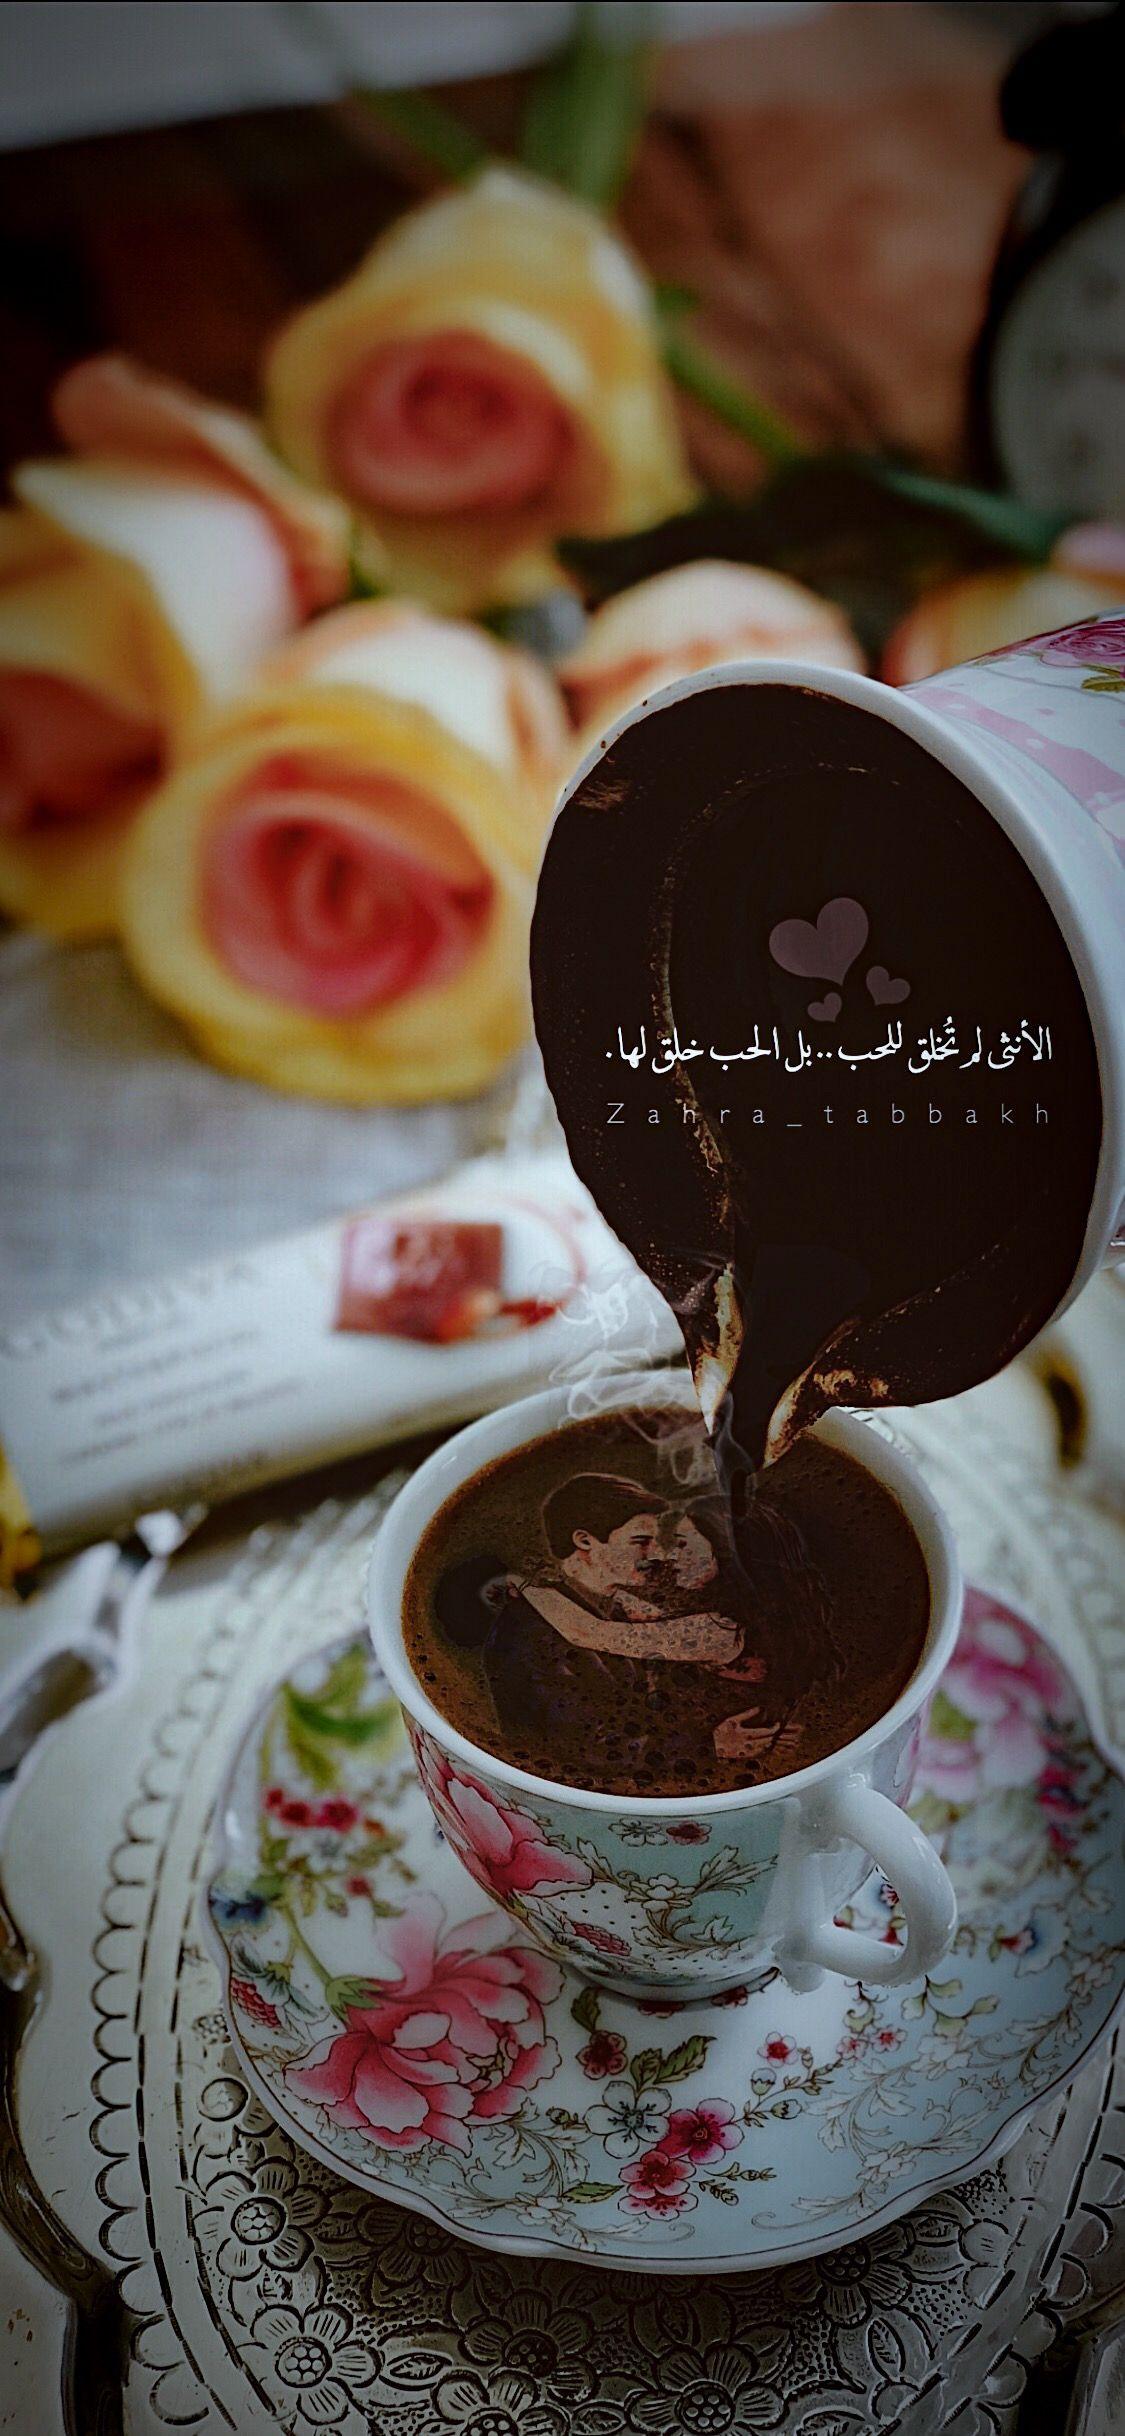 Coffee قهوة قهوه قهوتي هدوء سنابات سناب صباح مساء رمزيات بيسيات Sweet Words Coffee Quotes Arabic Love Quotes